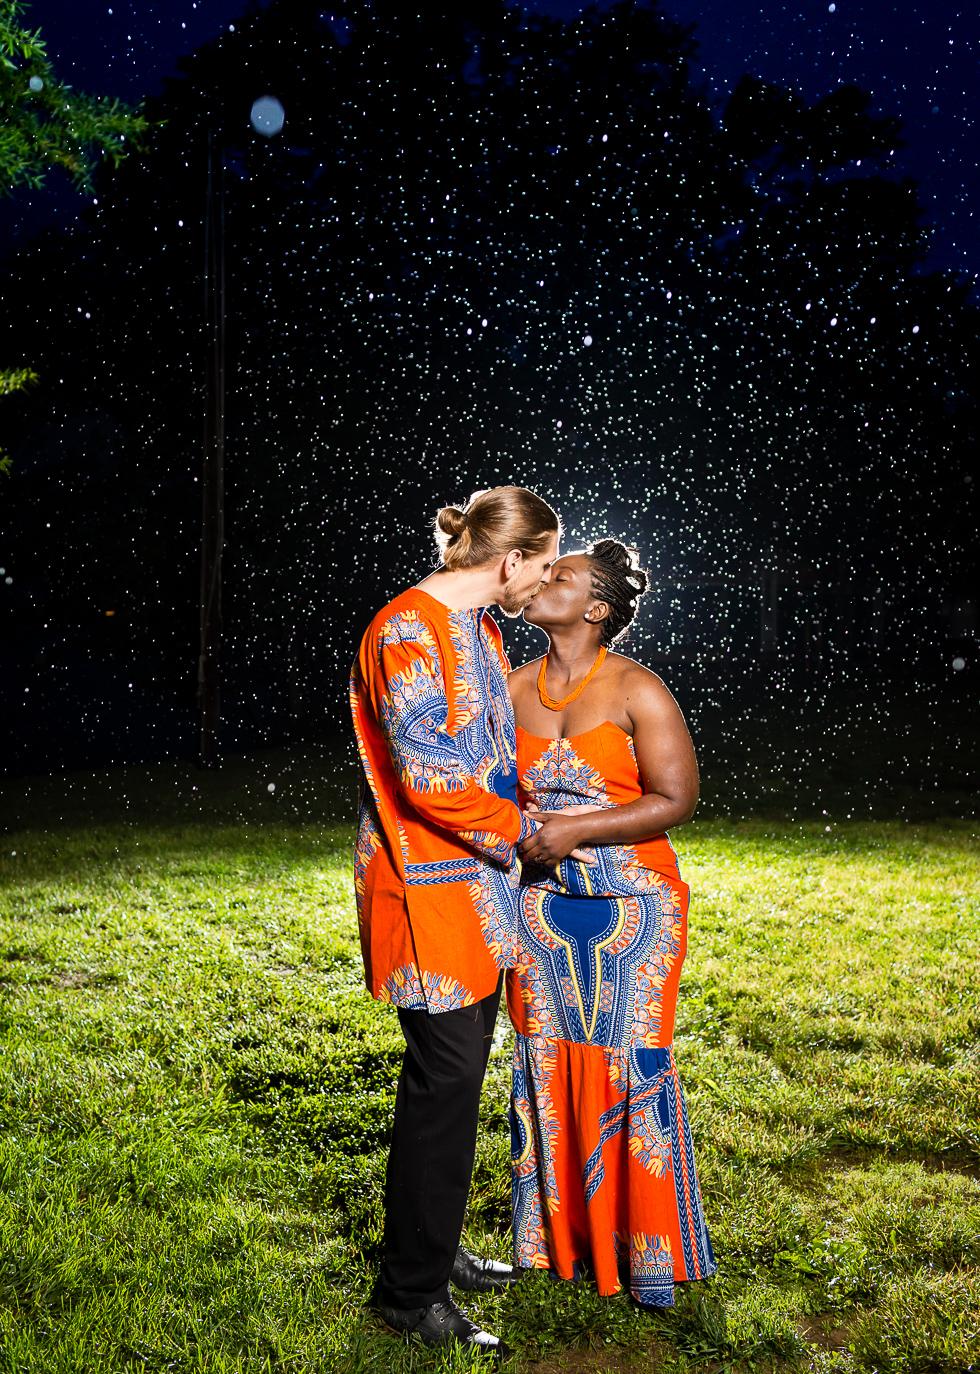 Destination-wedding-photographer-team-590.jpg